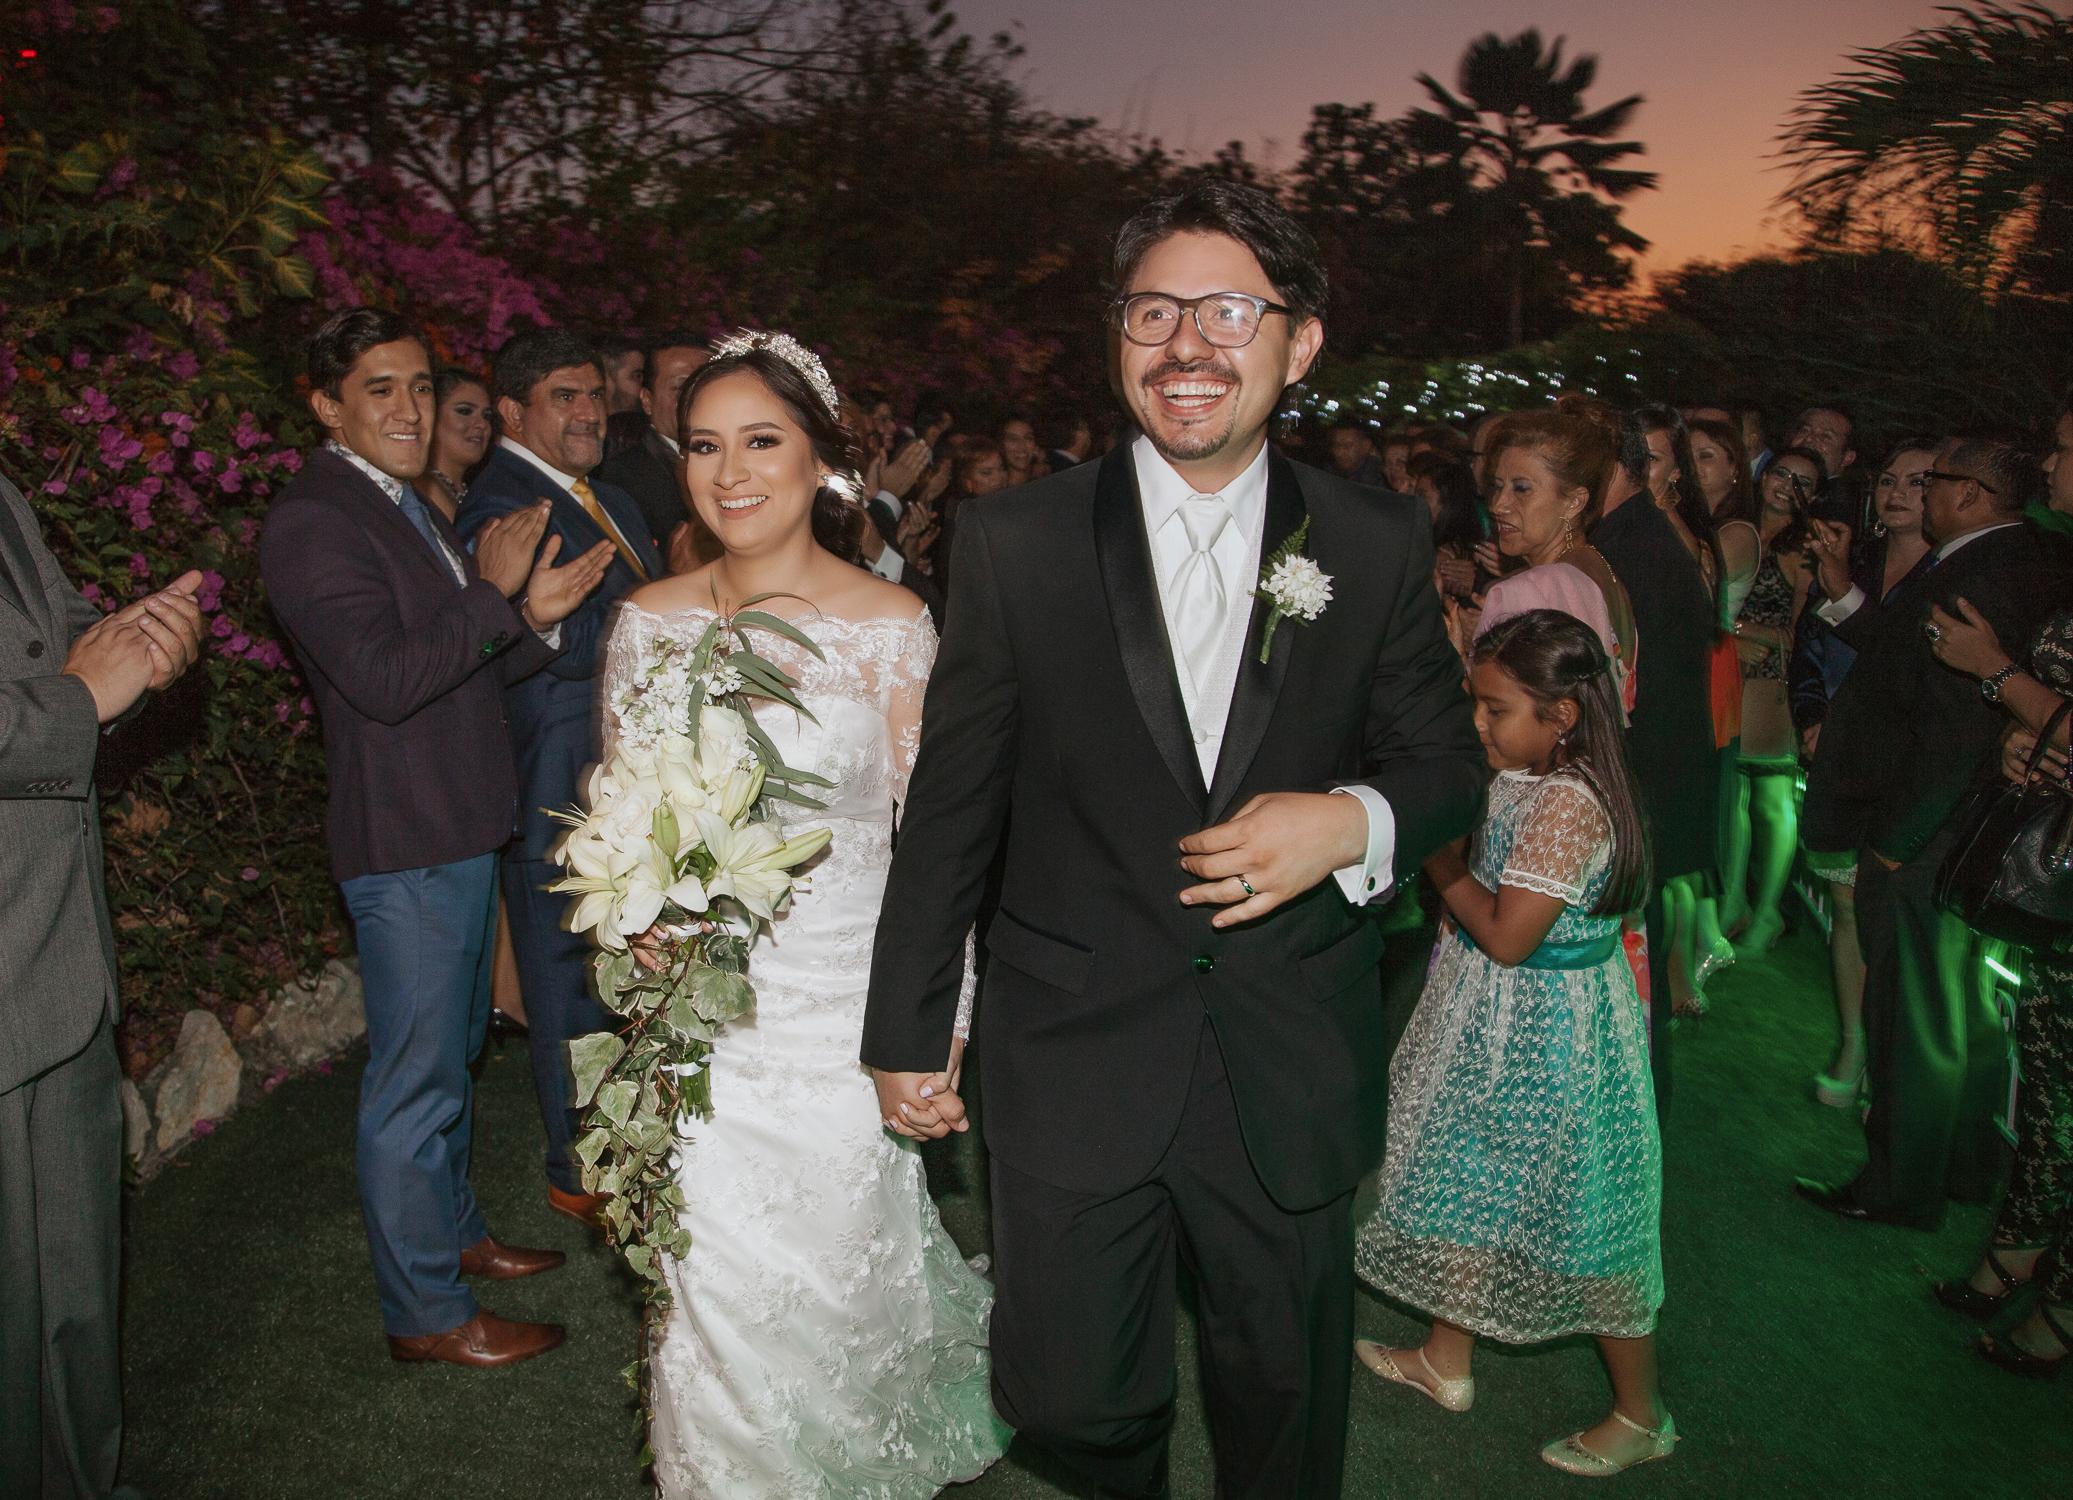 Michelle-Agurto-Fotografia-Bodas-Ecuador-Destination-Wedding-Photographer-Pauli-Edwin-27.JPG